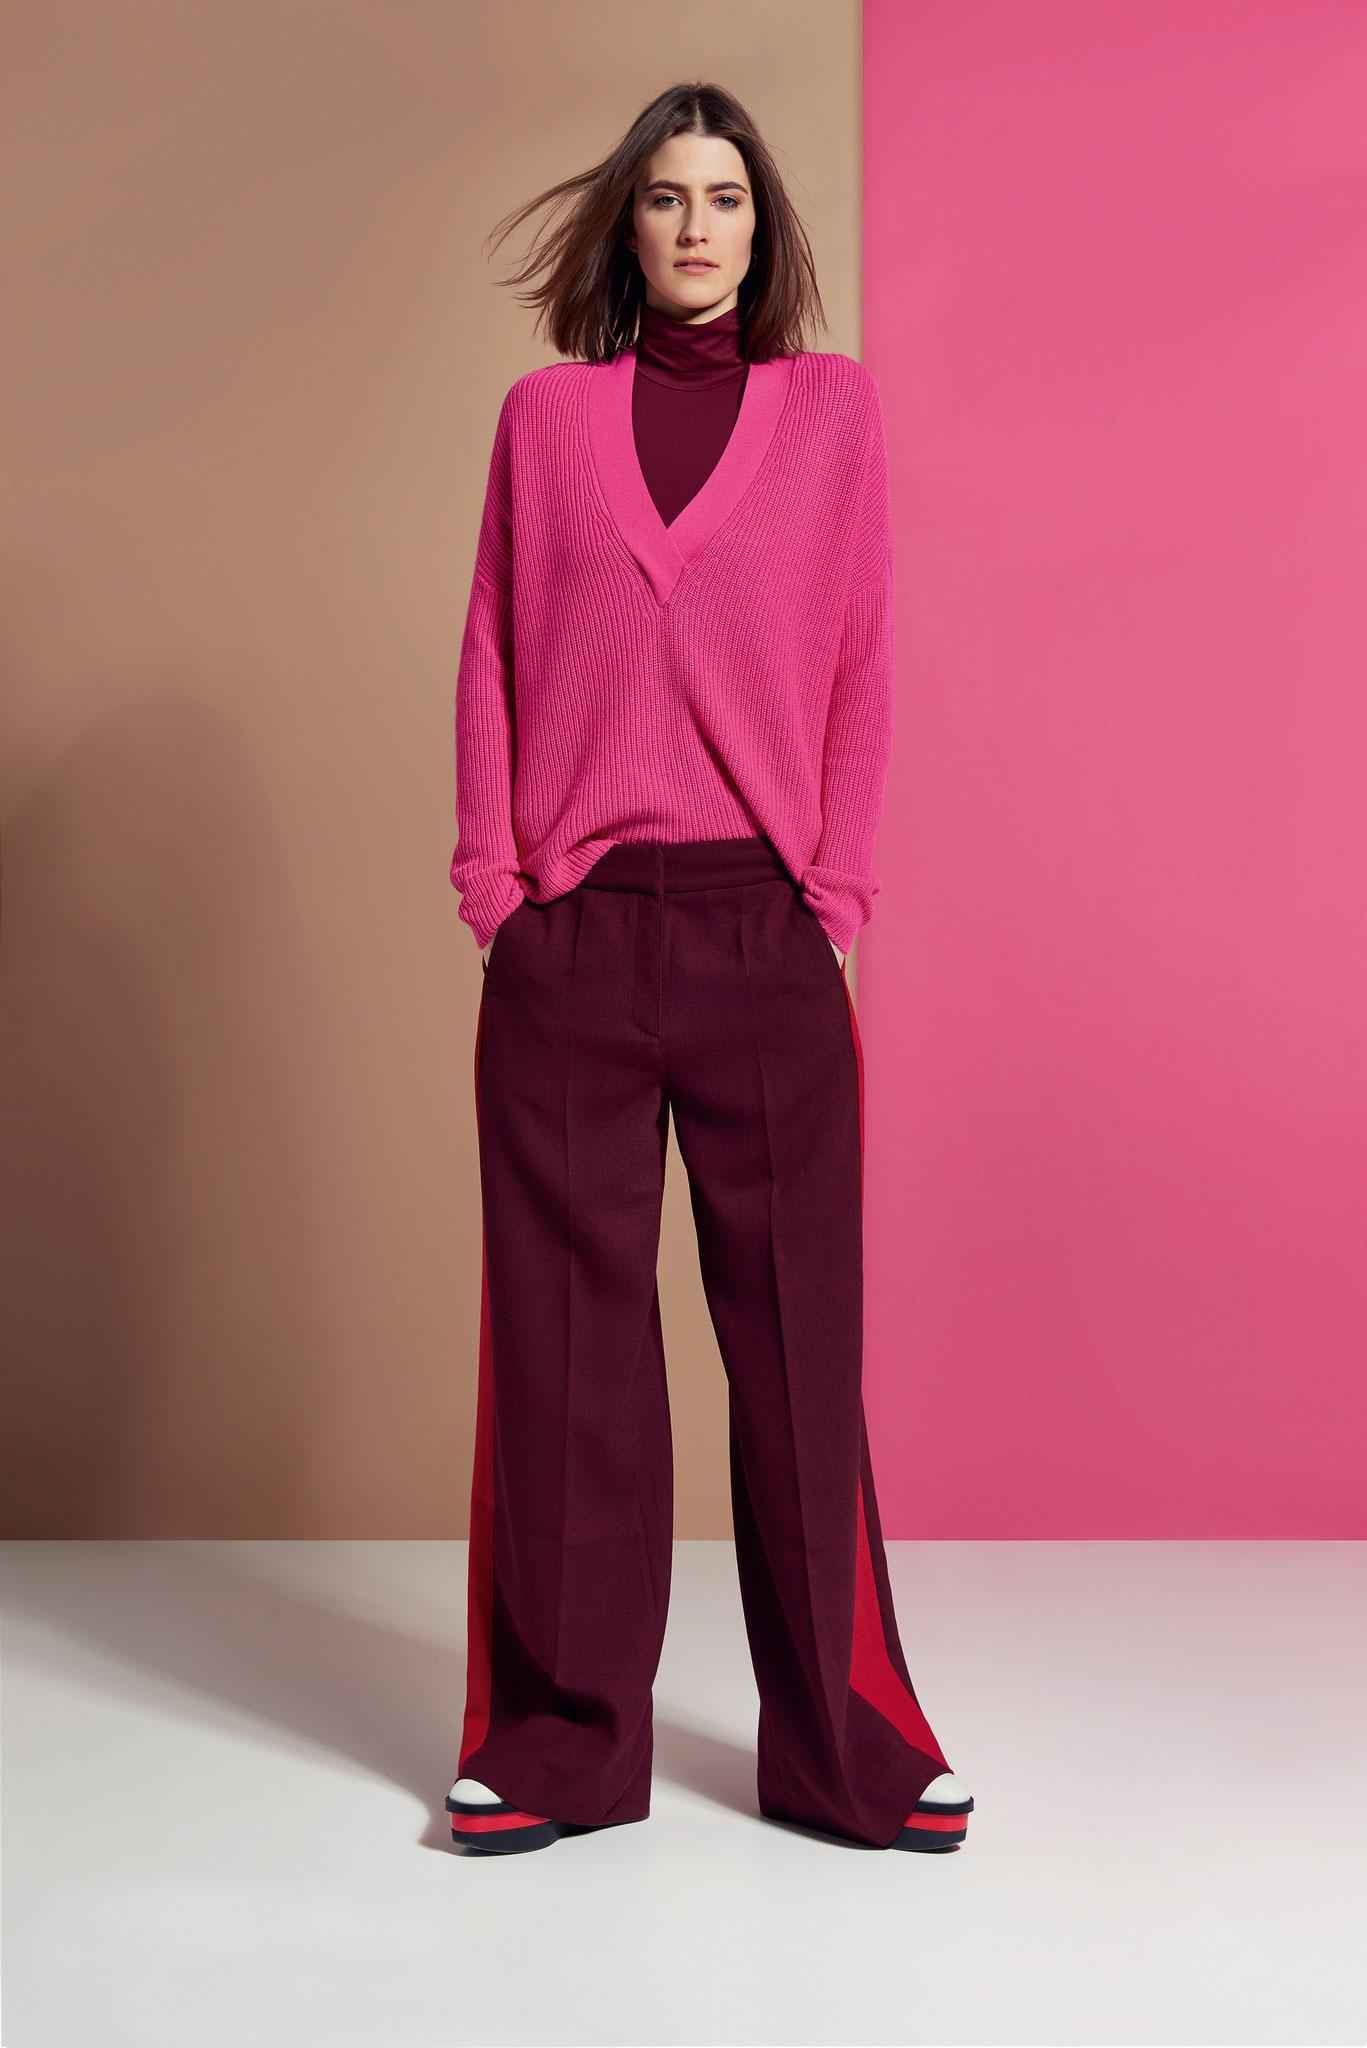 ESISTO Herbst Winter 2018 Kaschmir farbig pink